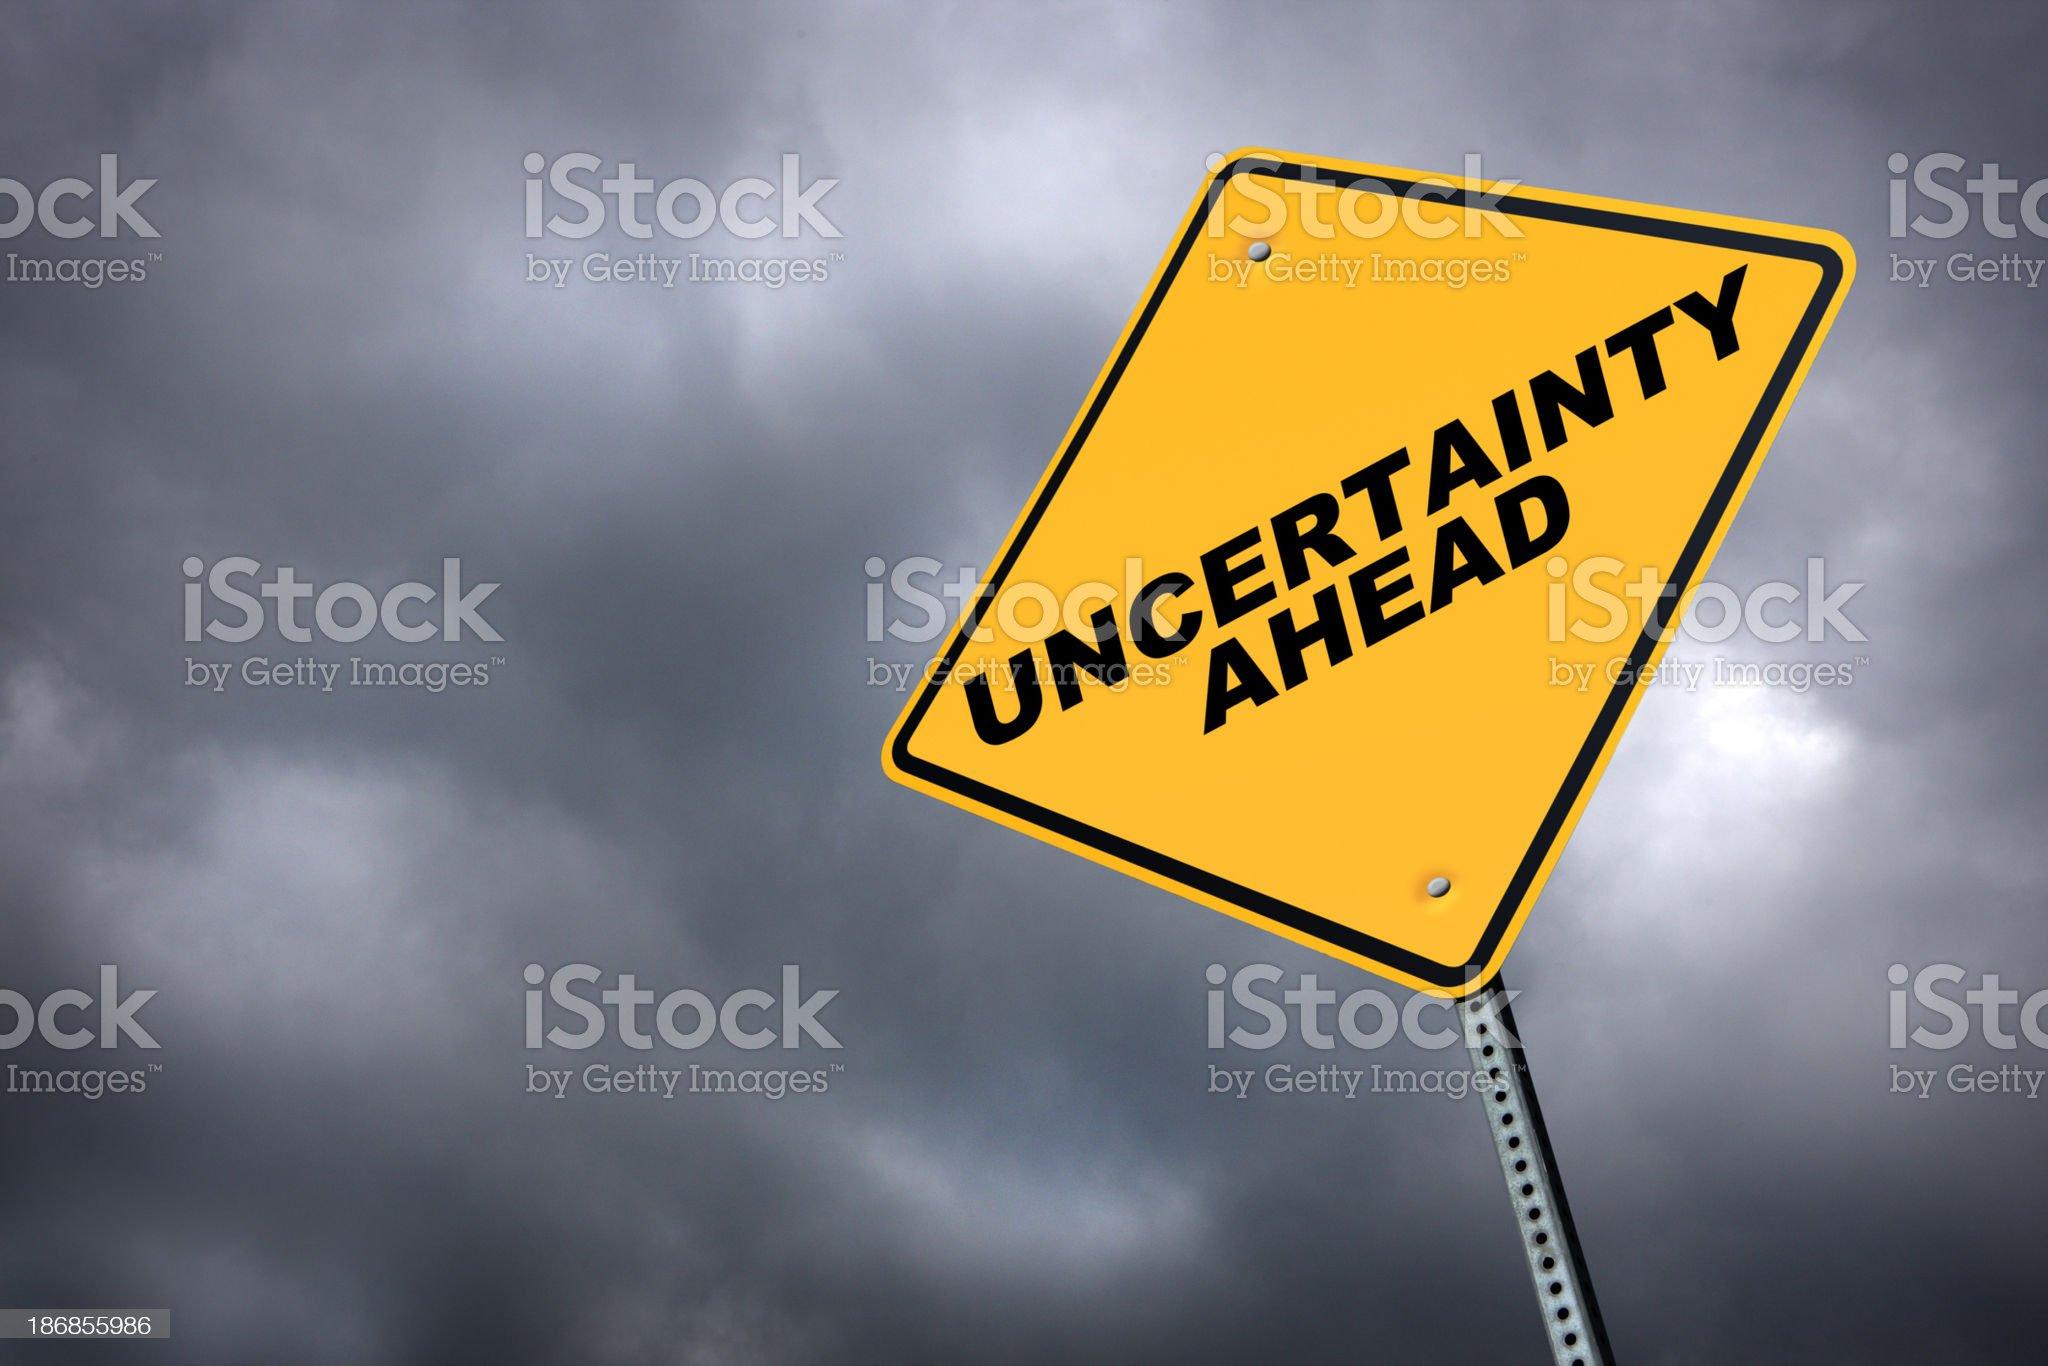 Uncertainty Ahead royalty-free stock photo